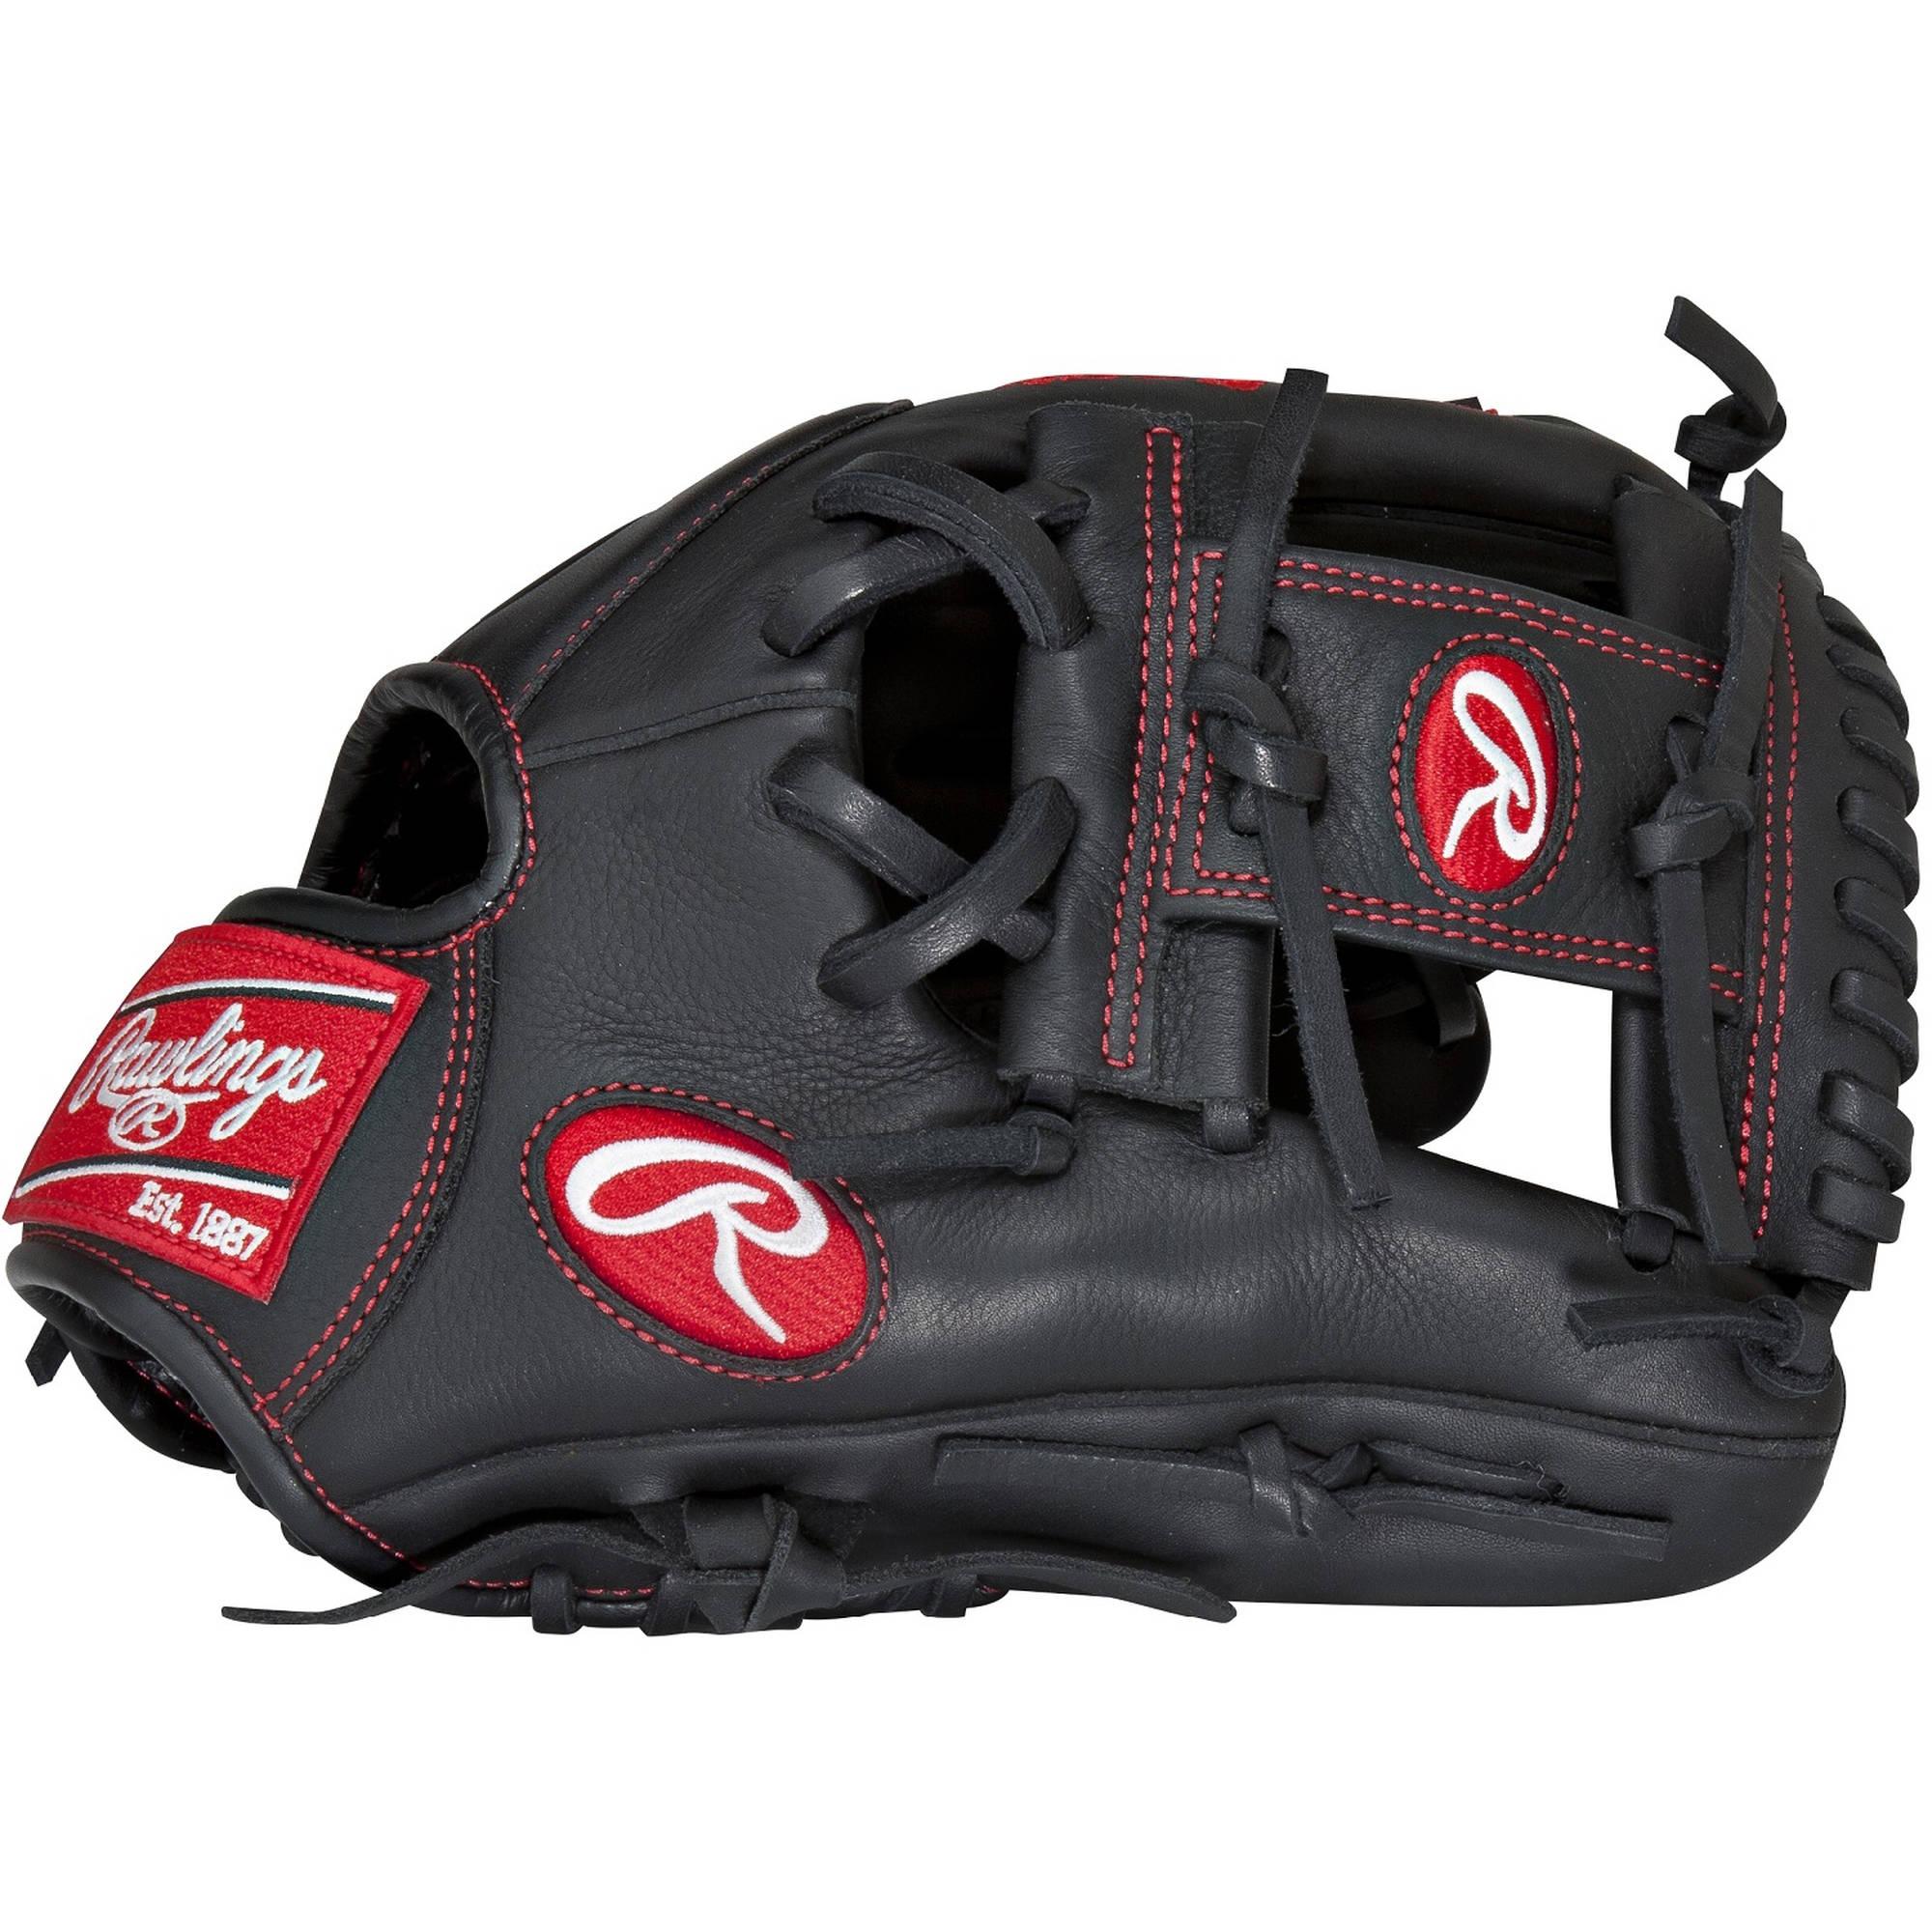 "Rawlings Gamer Series 12"" Youth Pro Taper Baseball Glove"